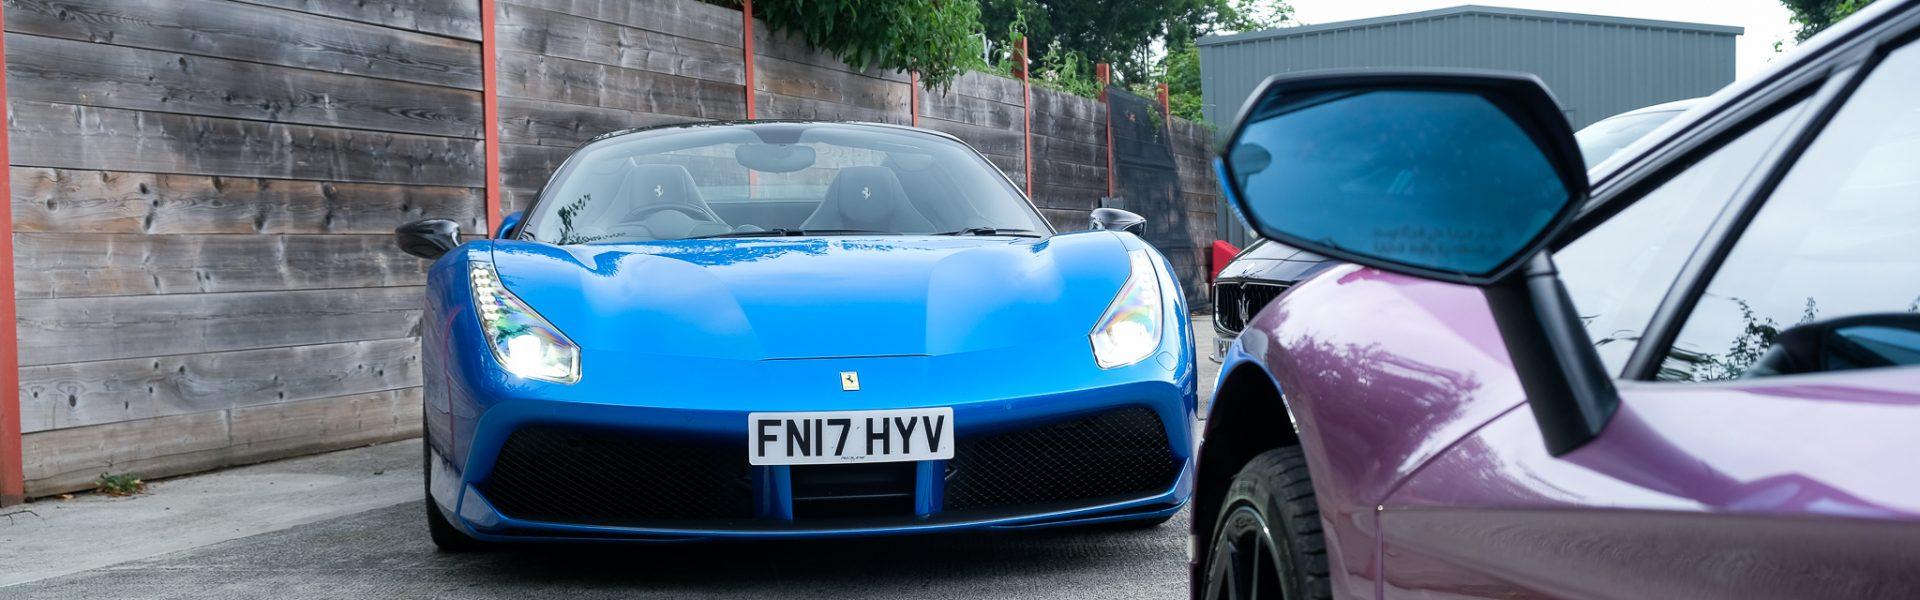 The UK's best 488 Spider?